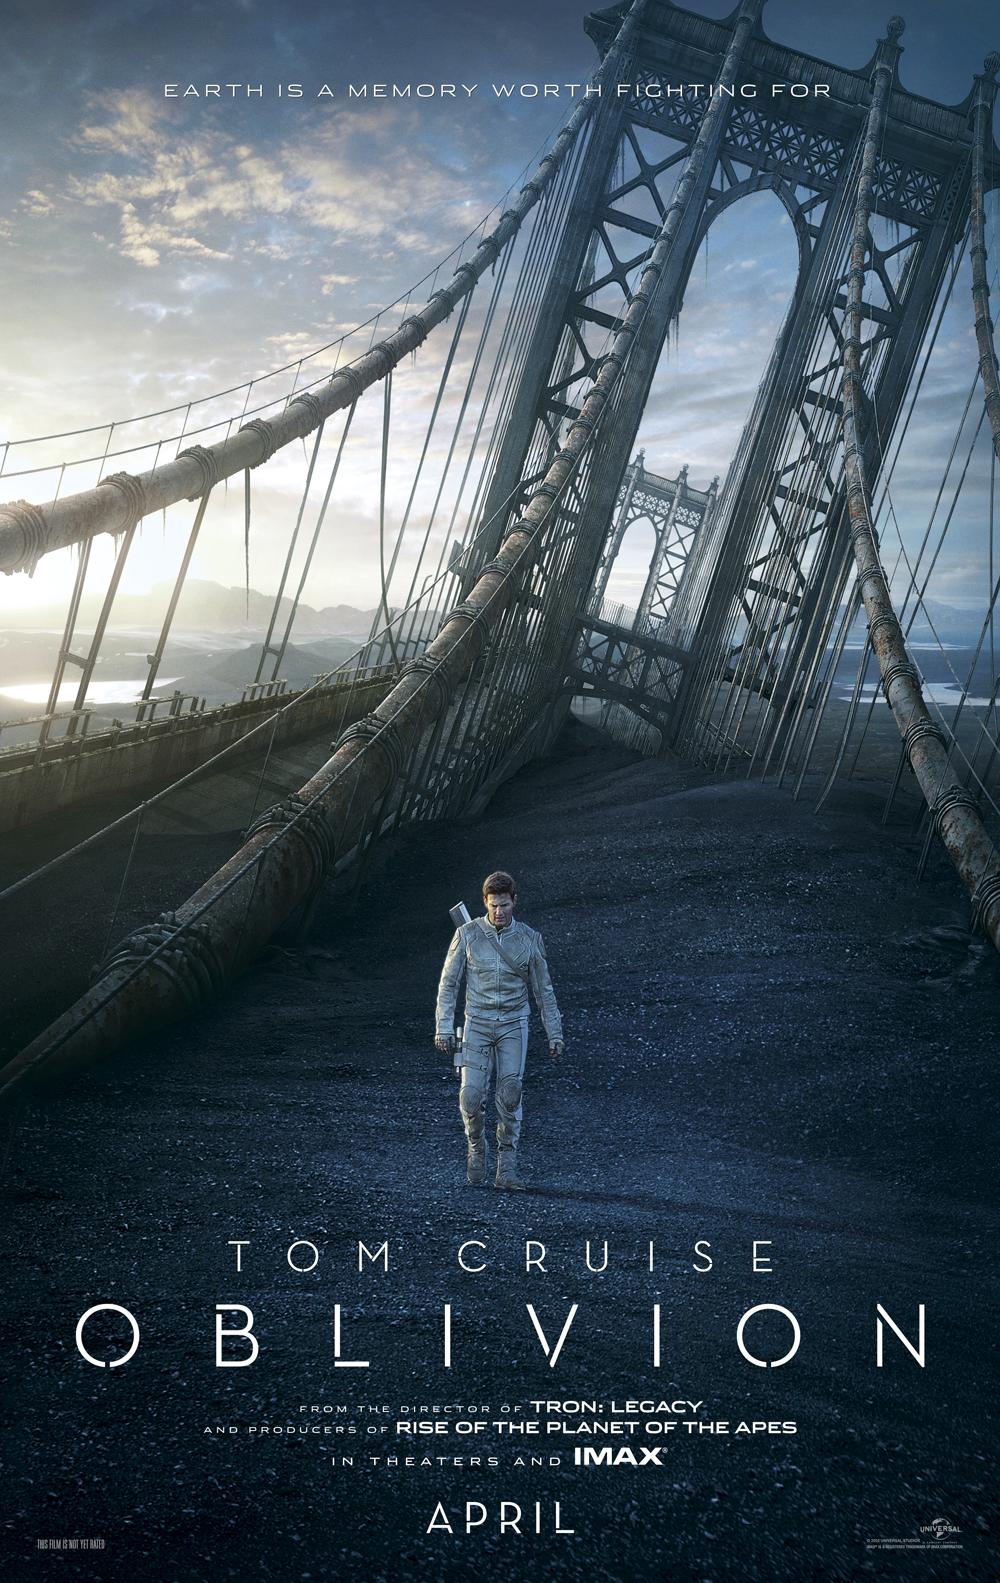 Oblivion.2013.UHD.BluRay.2160p.REMUX.DTS-HD.MA.7.1.HEVC.HuN-TRiNiTY